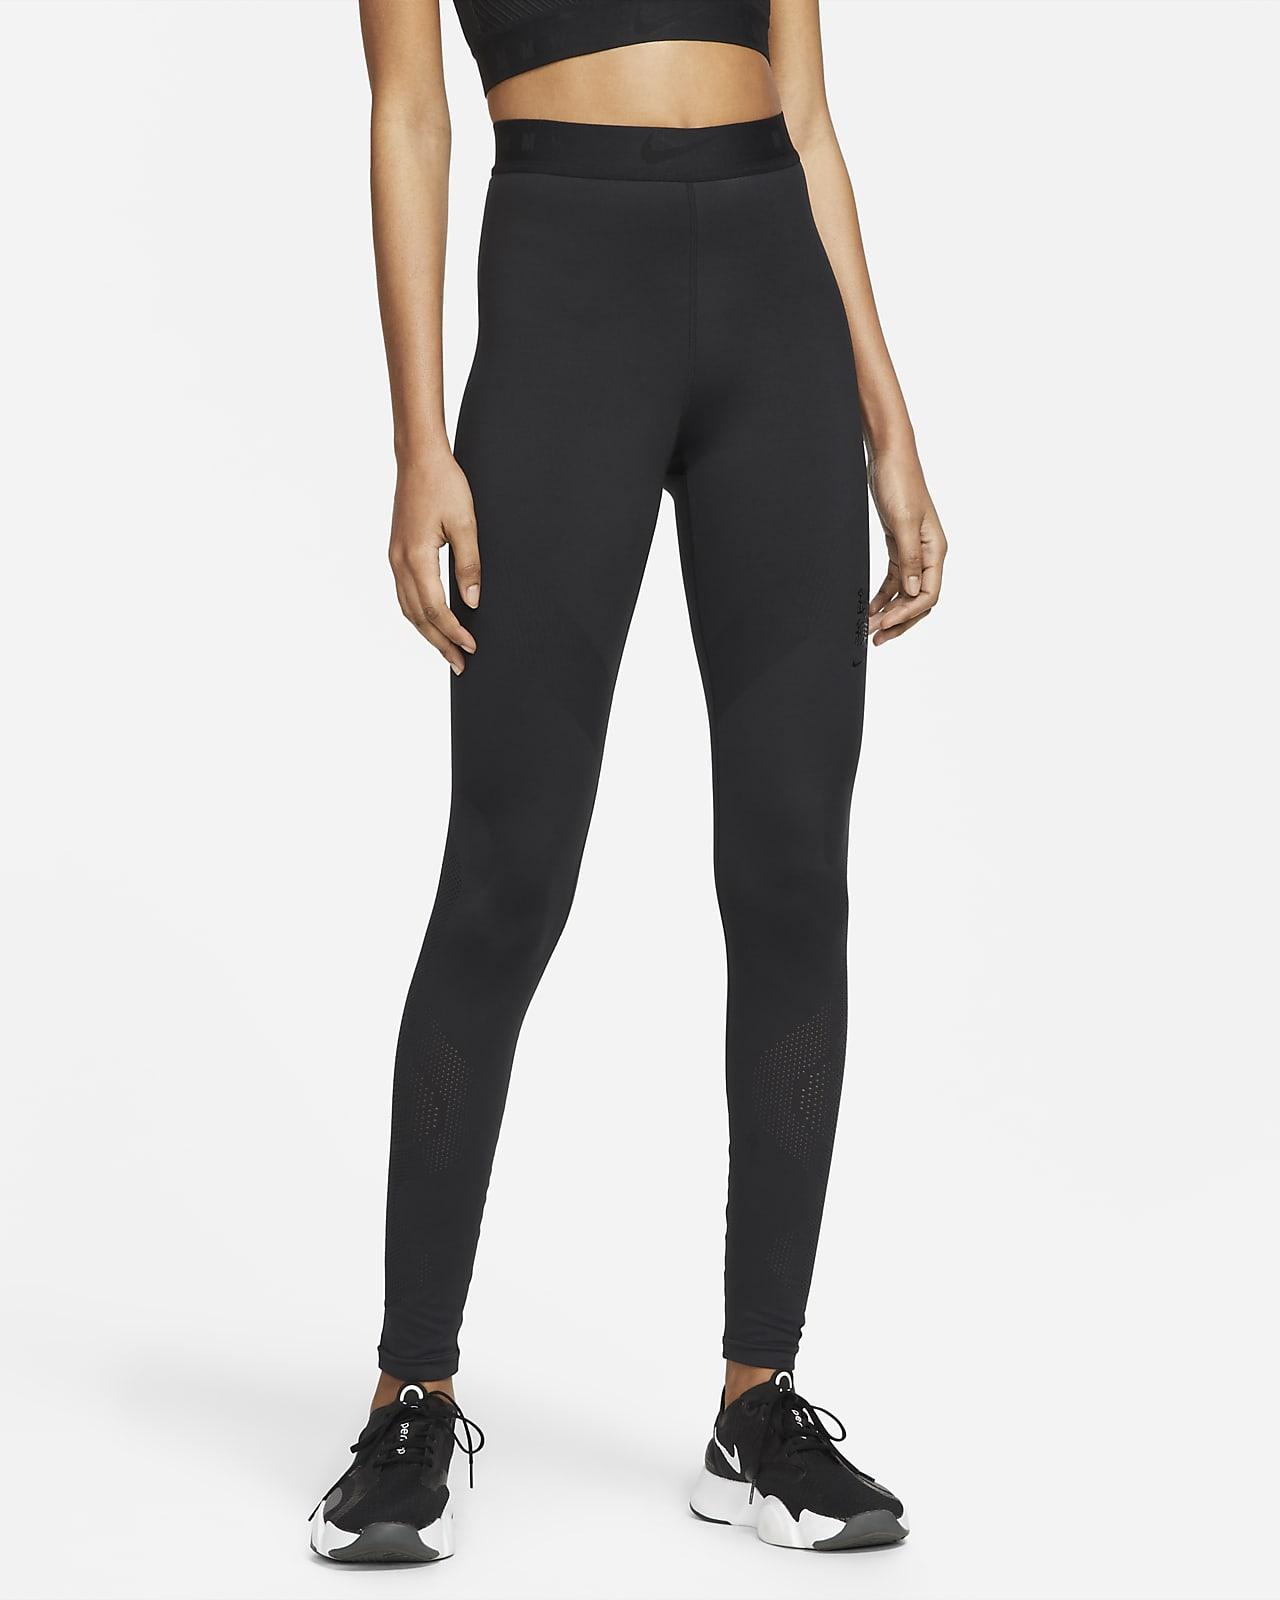 Nike x MMW Normal Belli Tayt